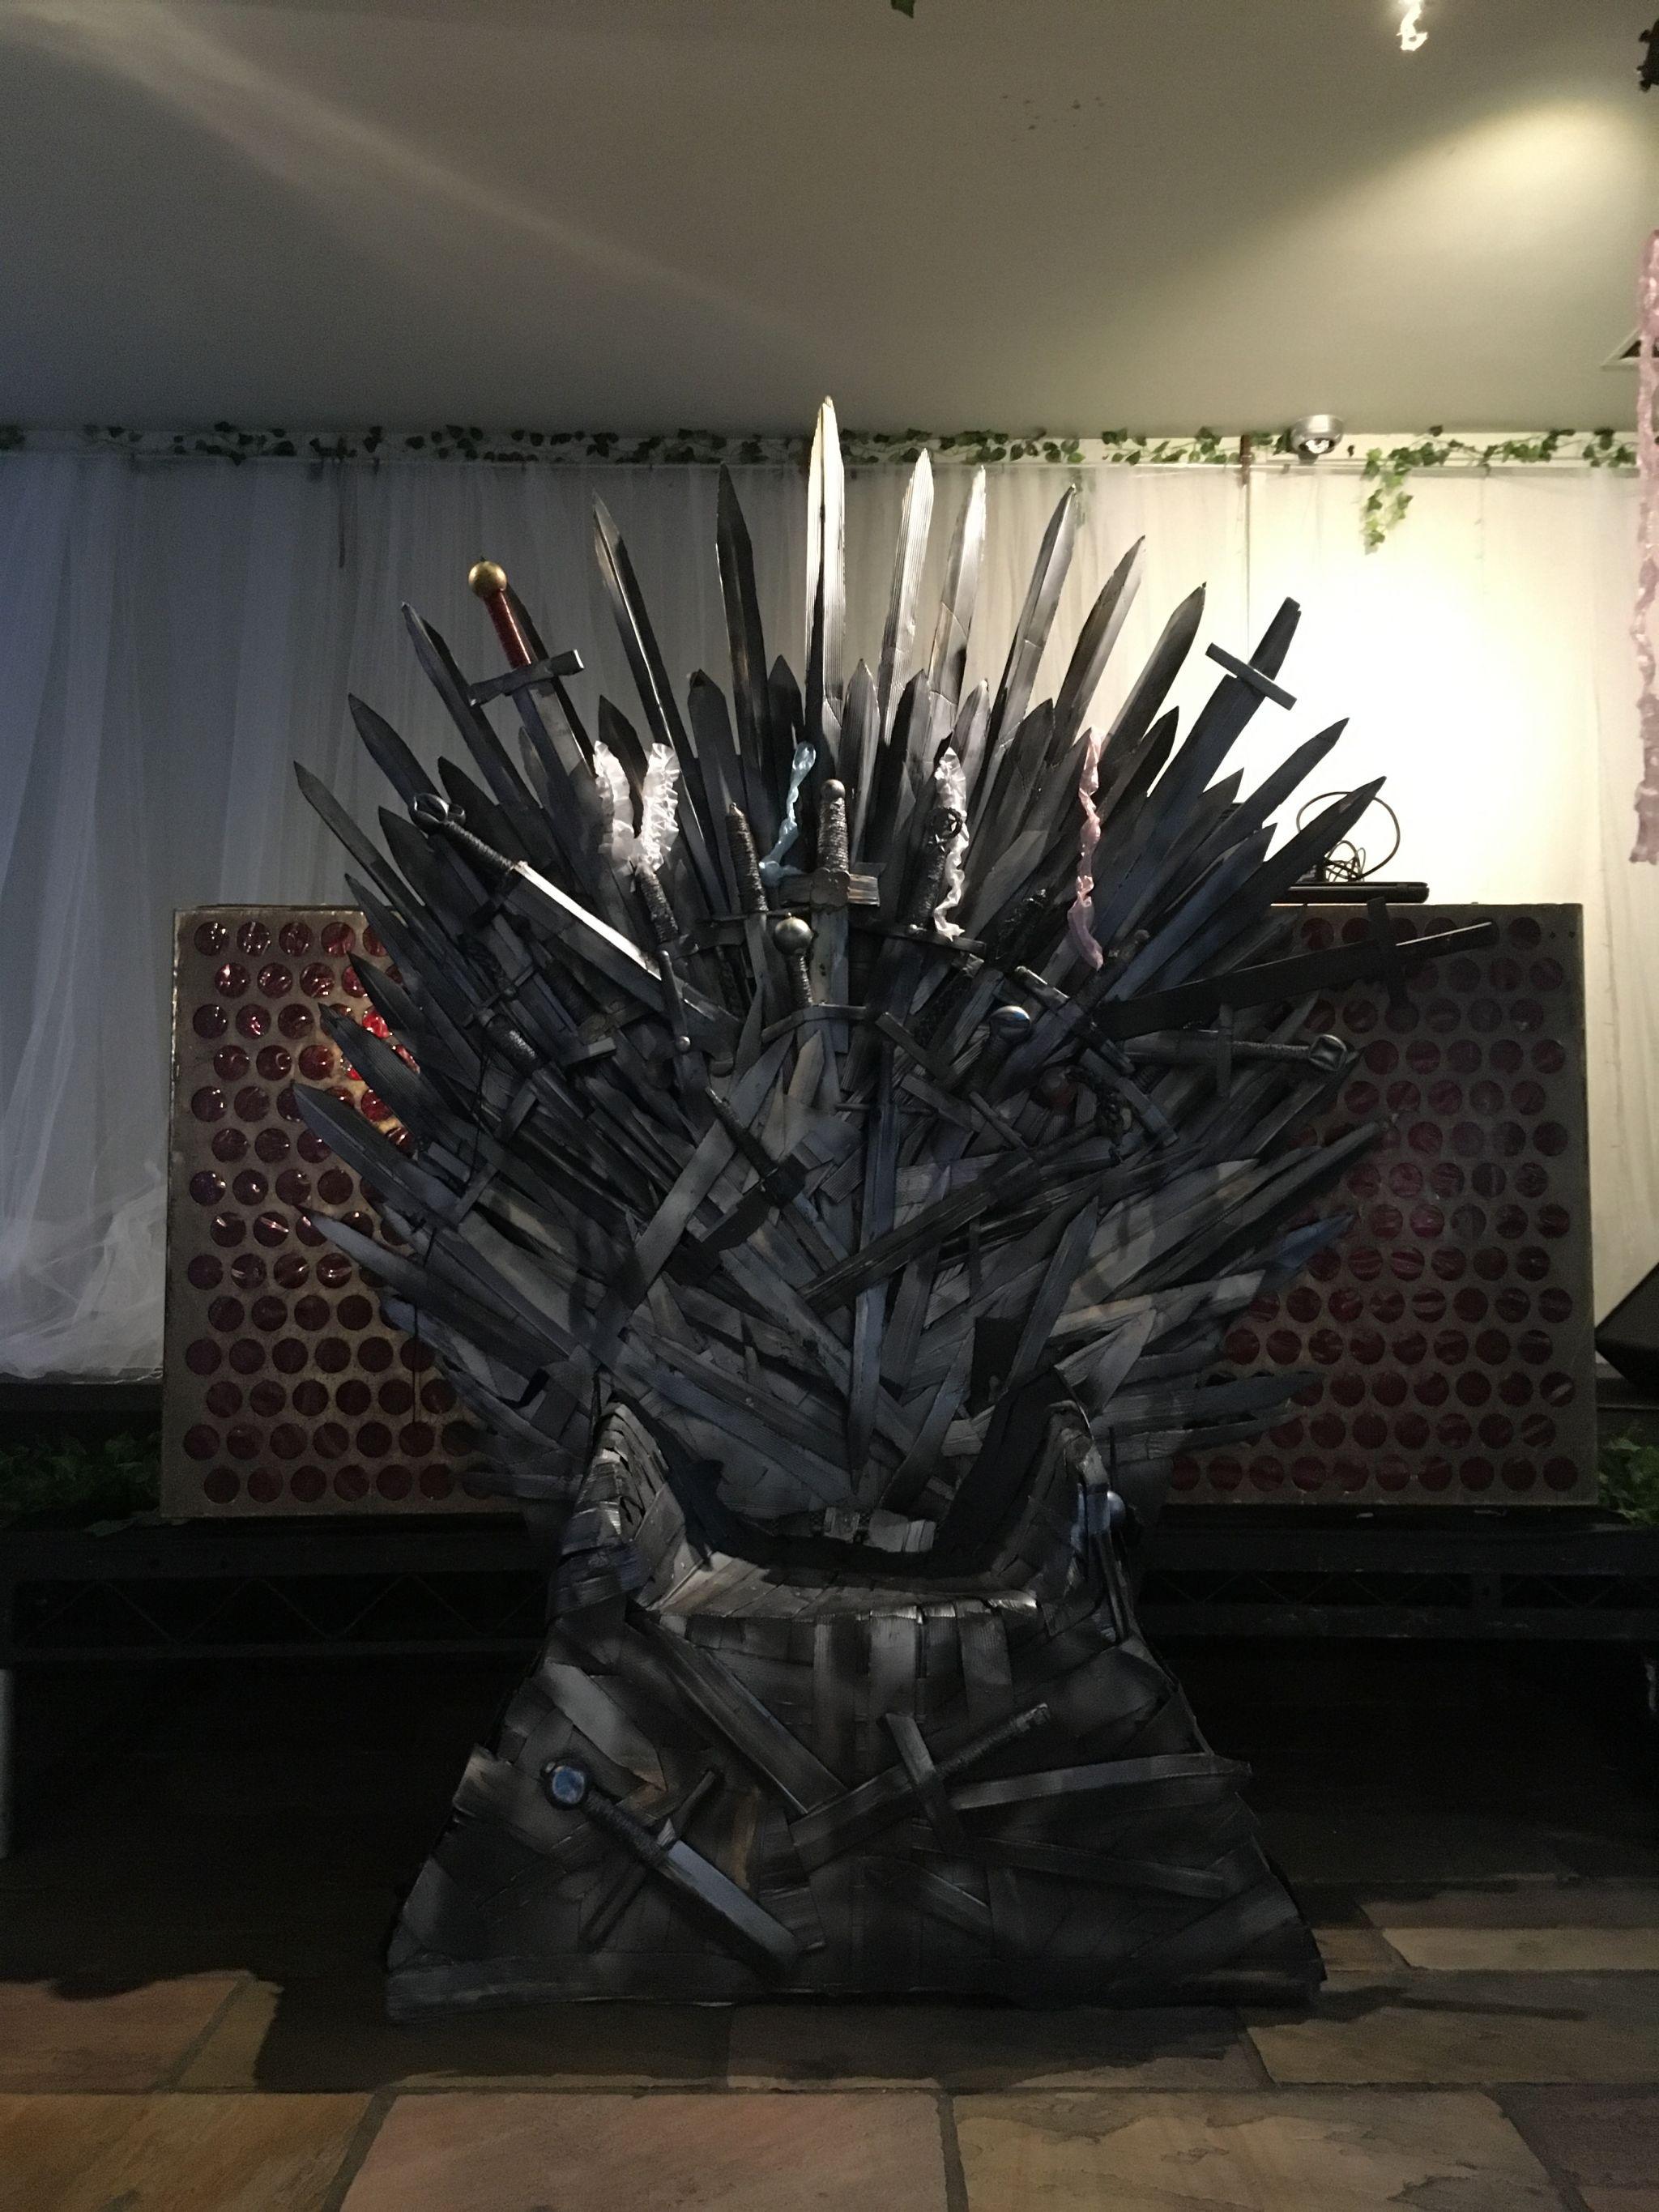 1 laura-devine-bride-wedding-planner-east-london-islington-metal-works-alternative-game-of-thrones-chair-got